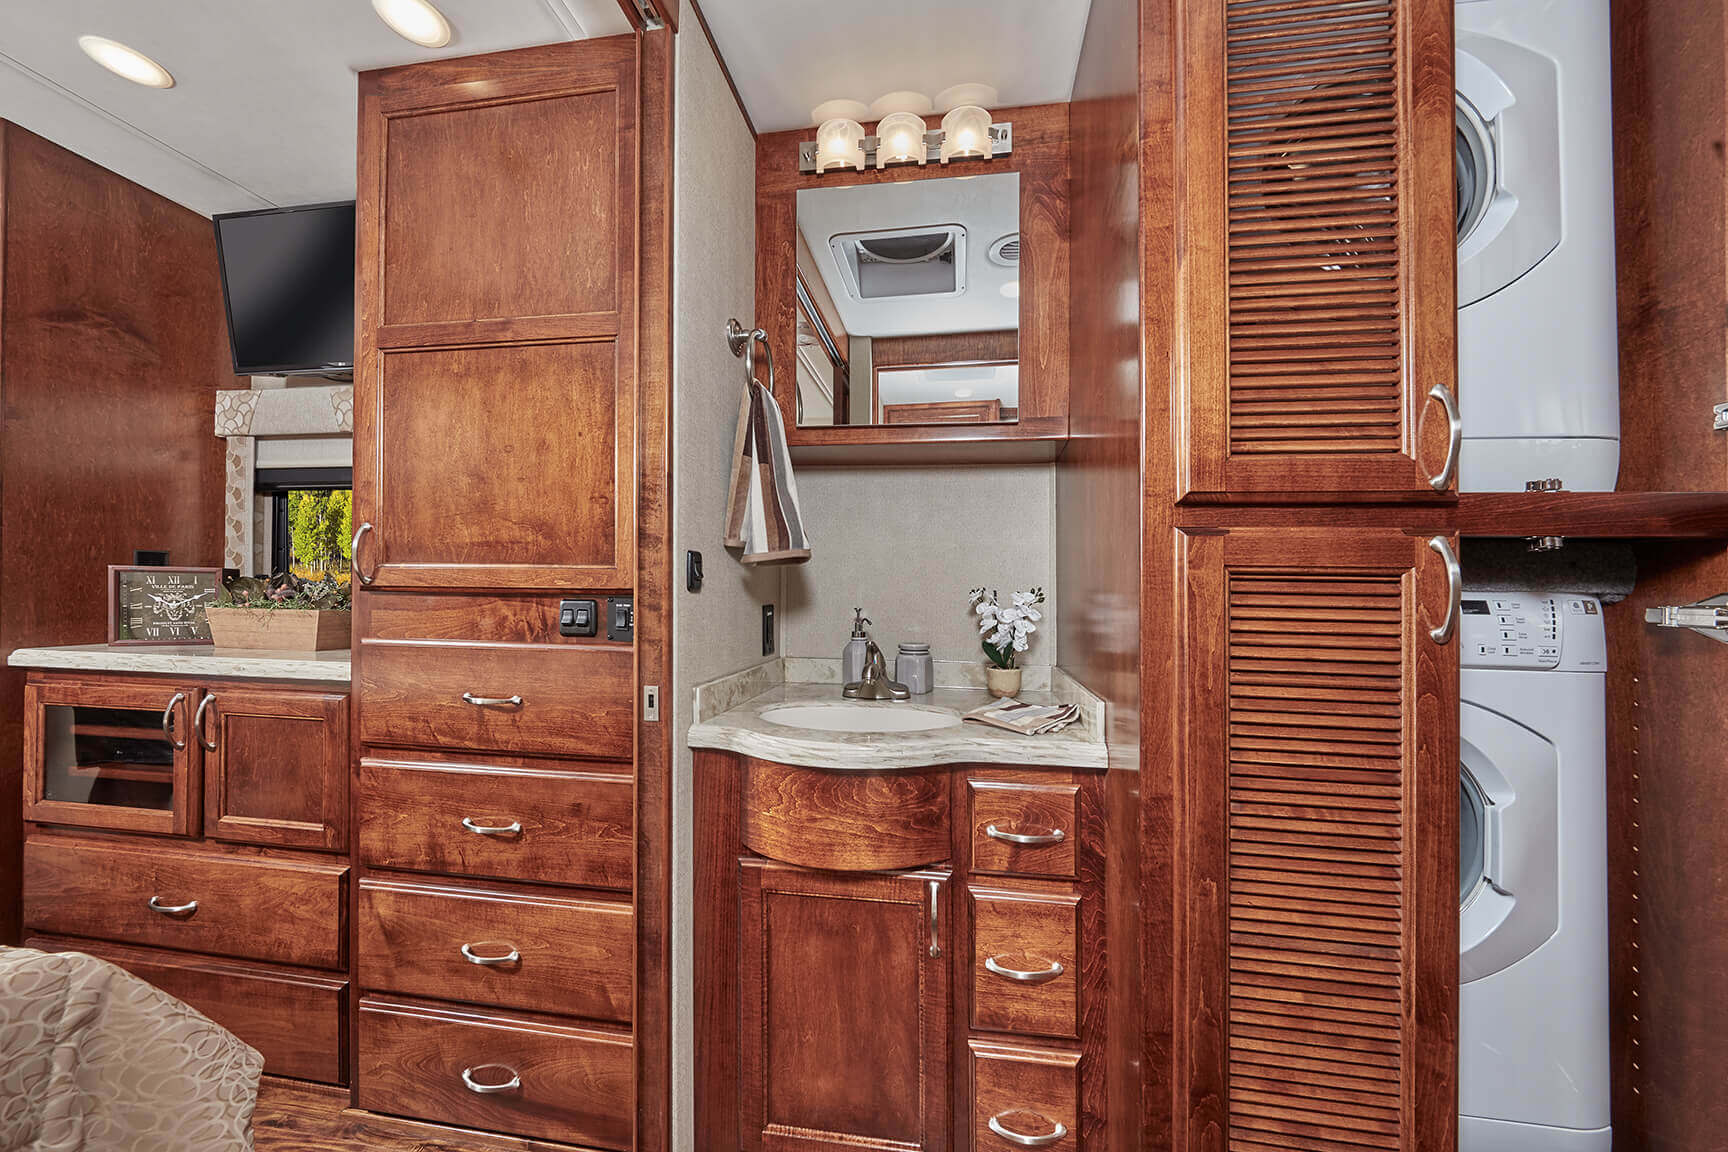 Freightliner Motorhomes Renegade Verona Motor Coach 2012 Colorado Fuse Box On 40vbh Enjoy 30 X 80 Bunk Beds With Privacy Curtains